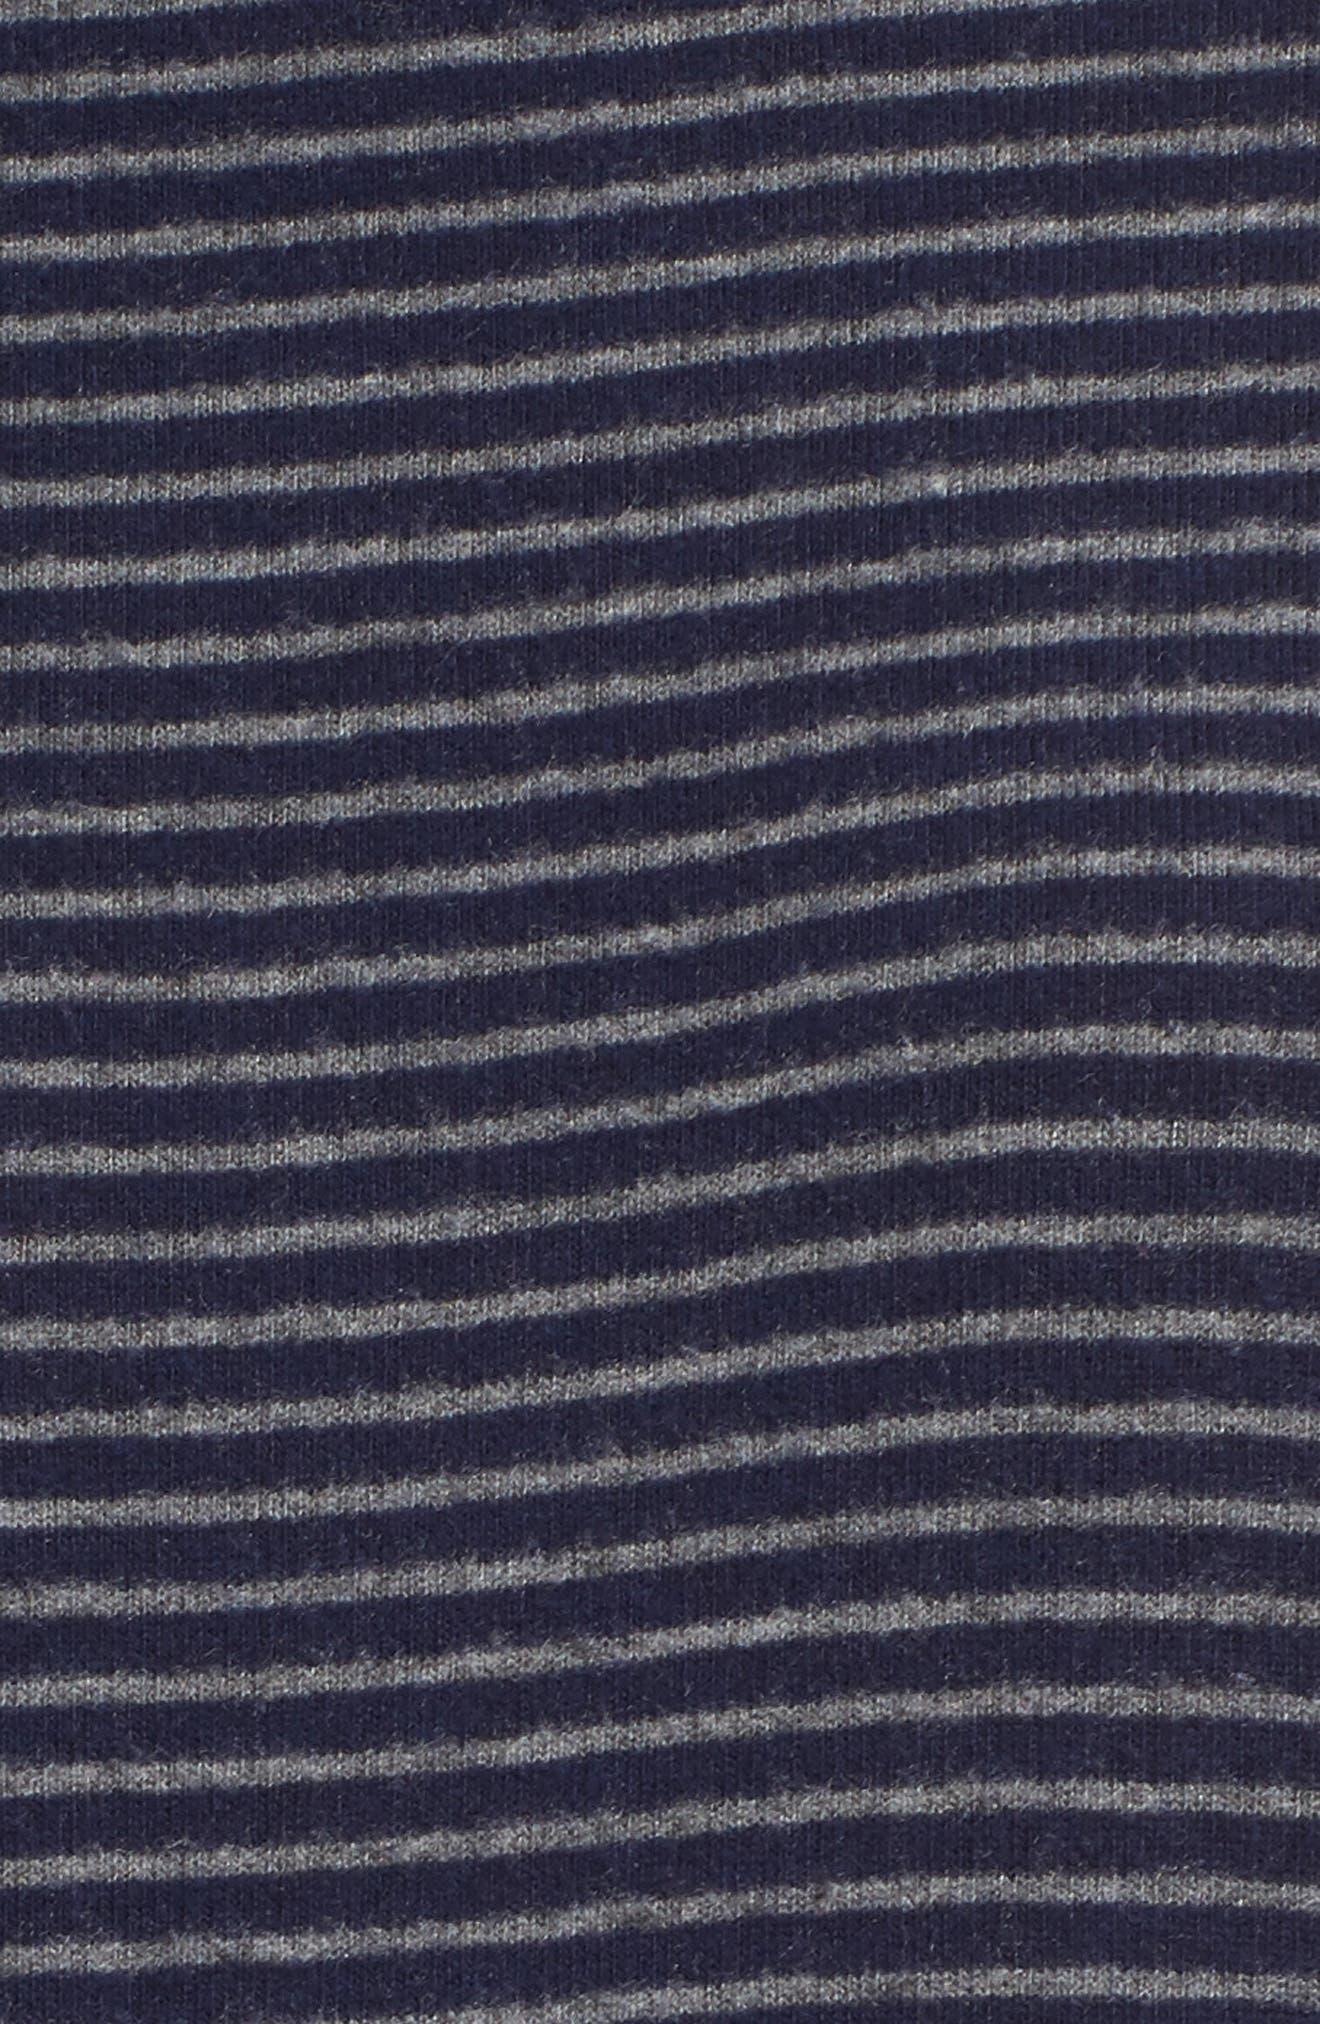 Stripe Draped Hoodie,                             Alternate thumbnail 5, color,                             Navy